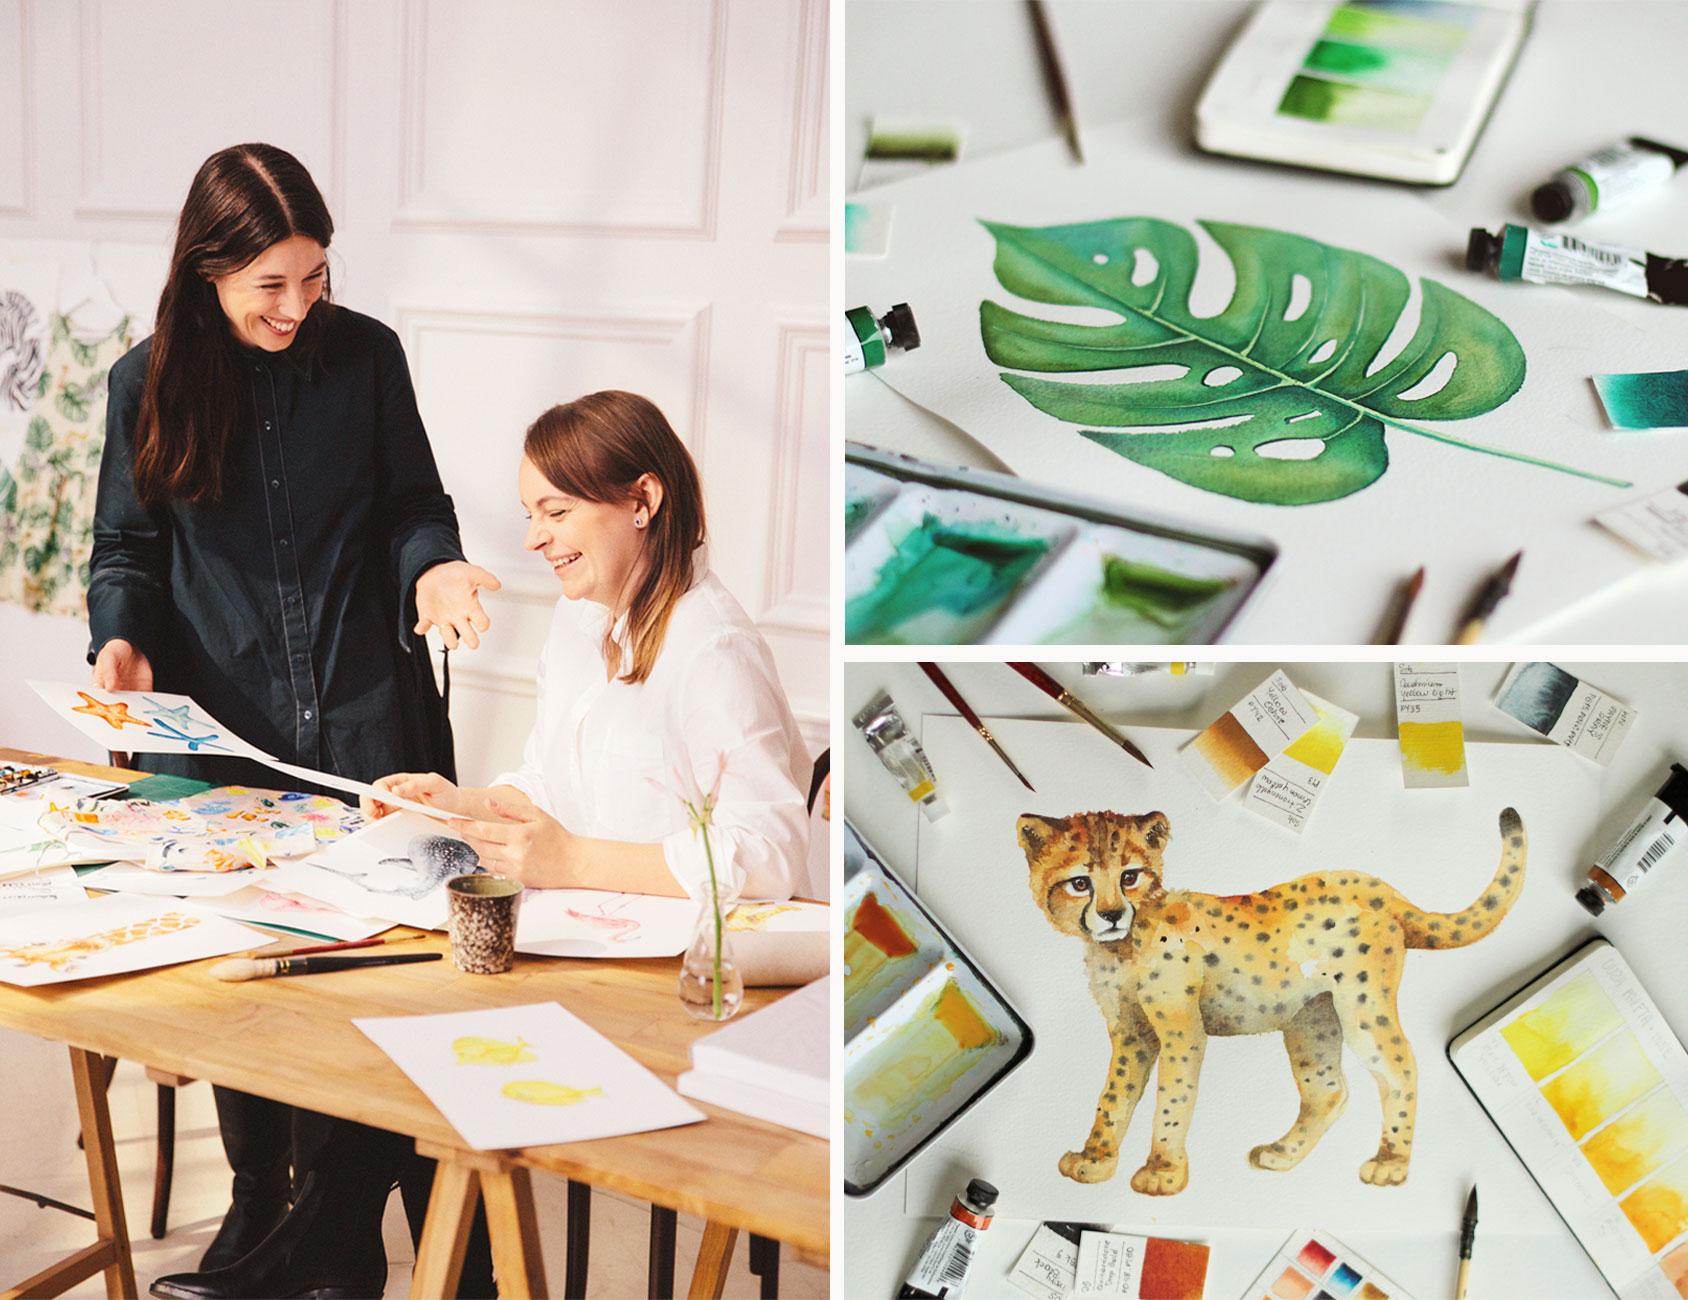 Karolina Kijak and Sofia Löfstedt, Head of Design Kids at H&M, discuss the sketches in Karolina's studio.